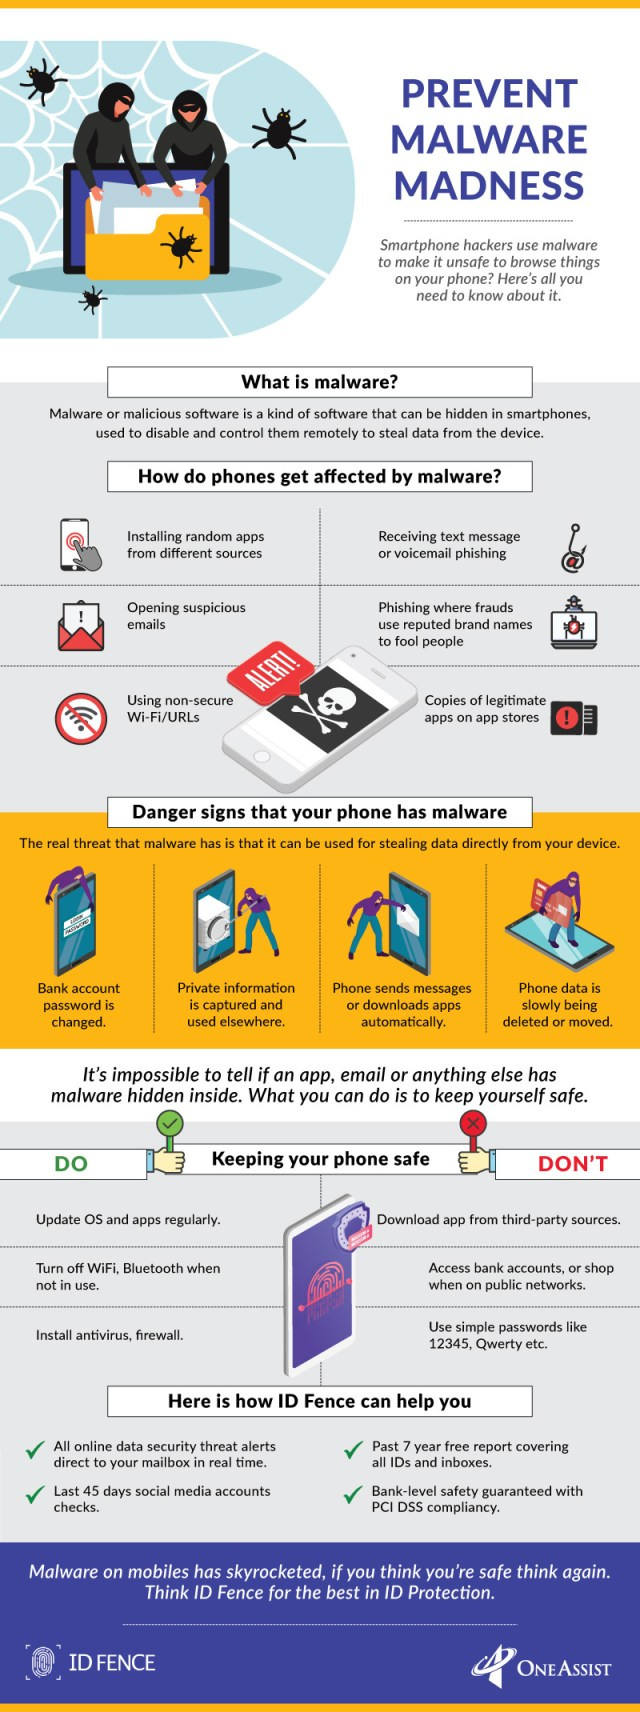 Prevent-Malware-Madness_revised.jpg